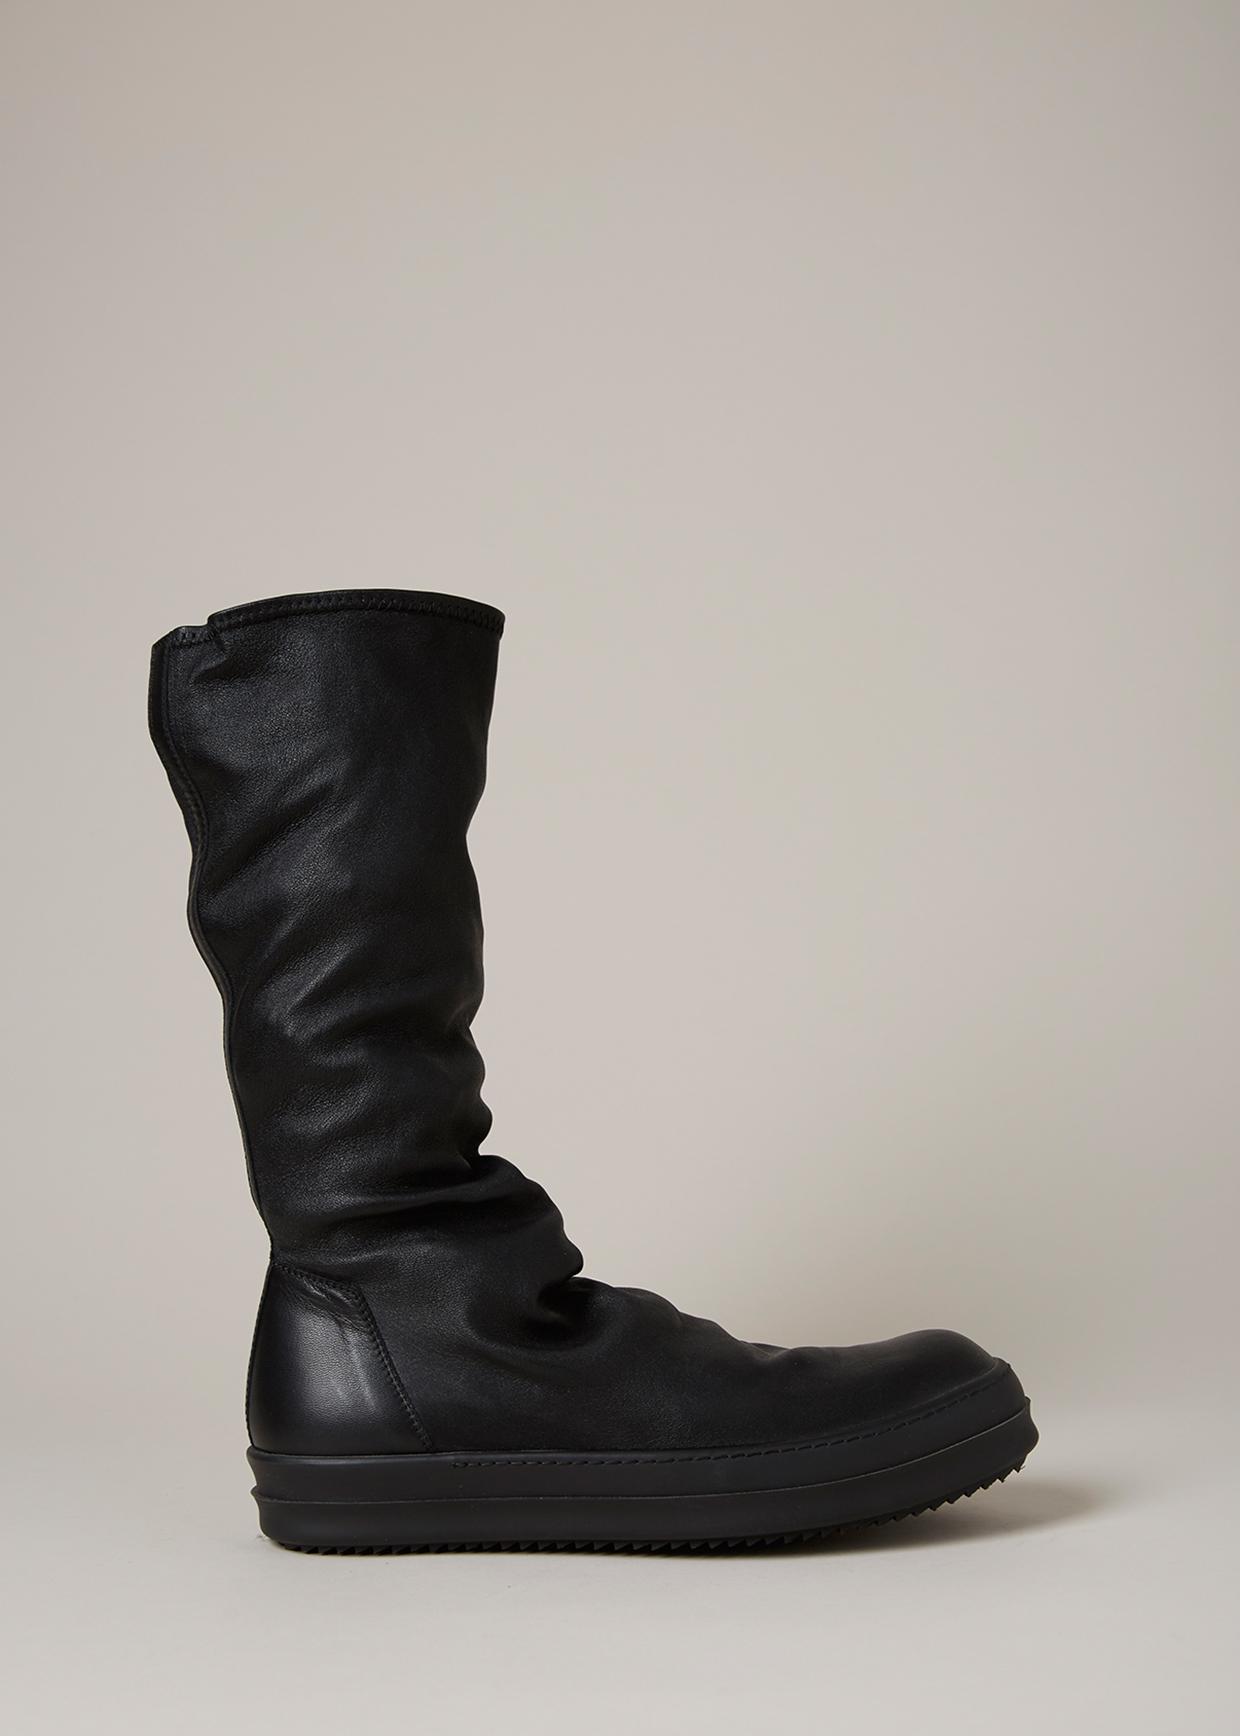 Stocking sneakers - Black Rick Owens vVMloLT2I